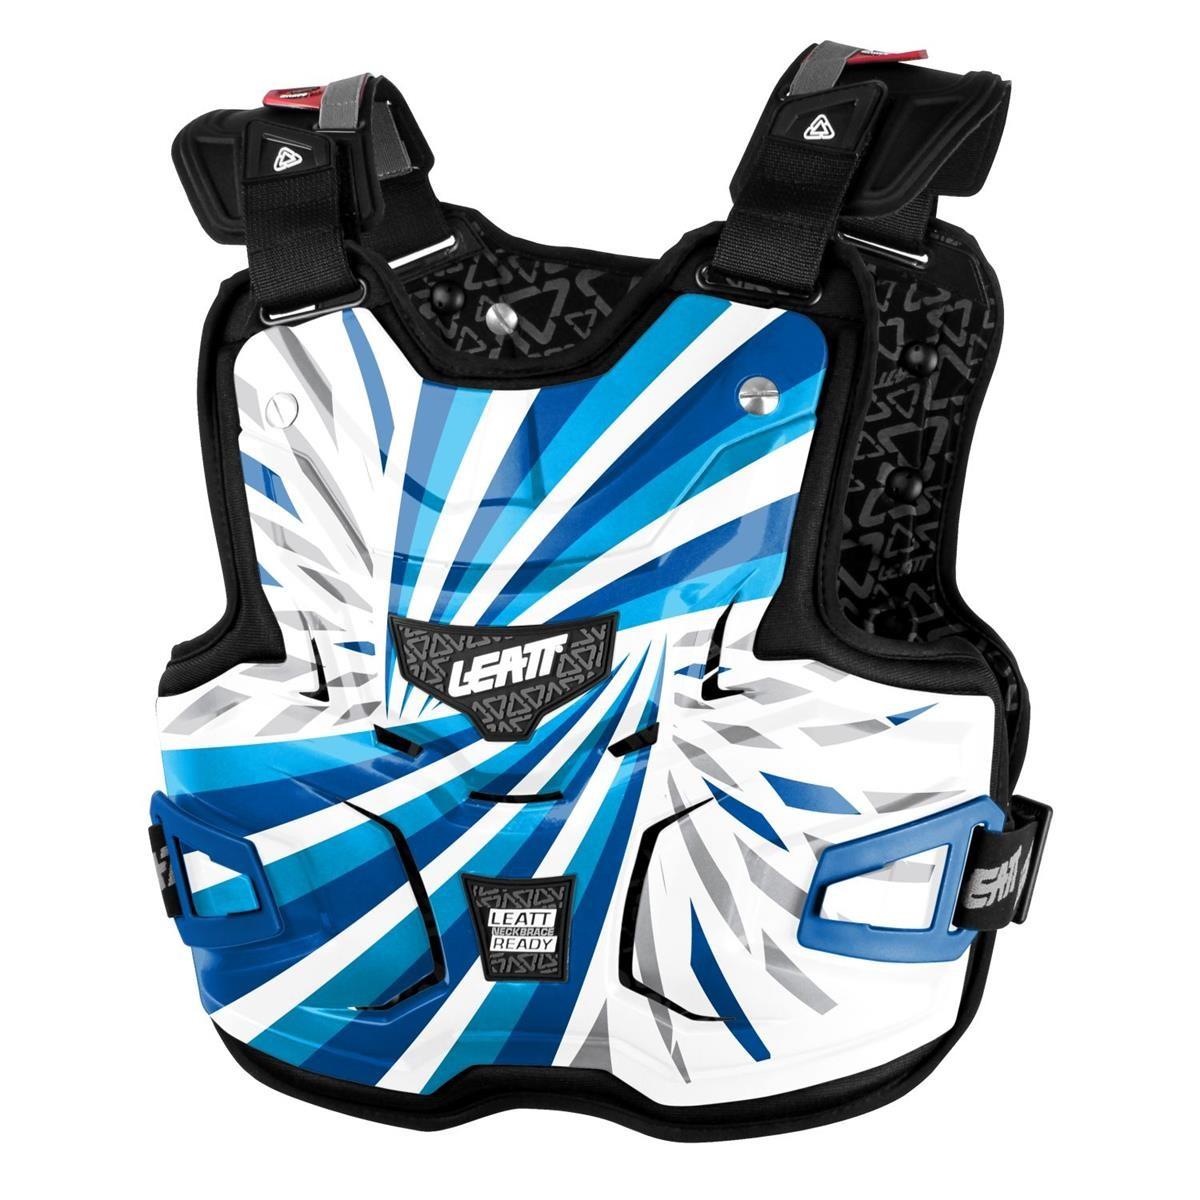 Enduro4you - Leatt Brace Adventure Brustpanzer-Chestprotector Lite